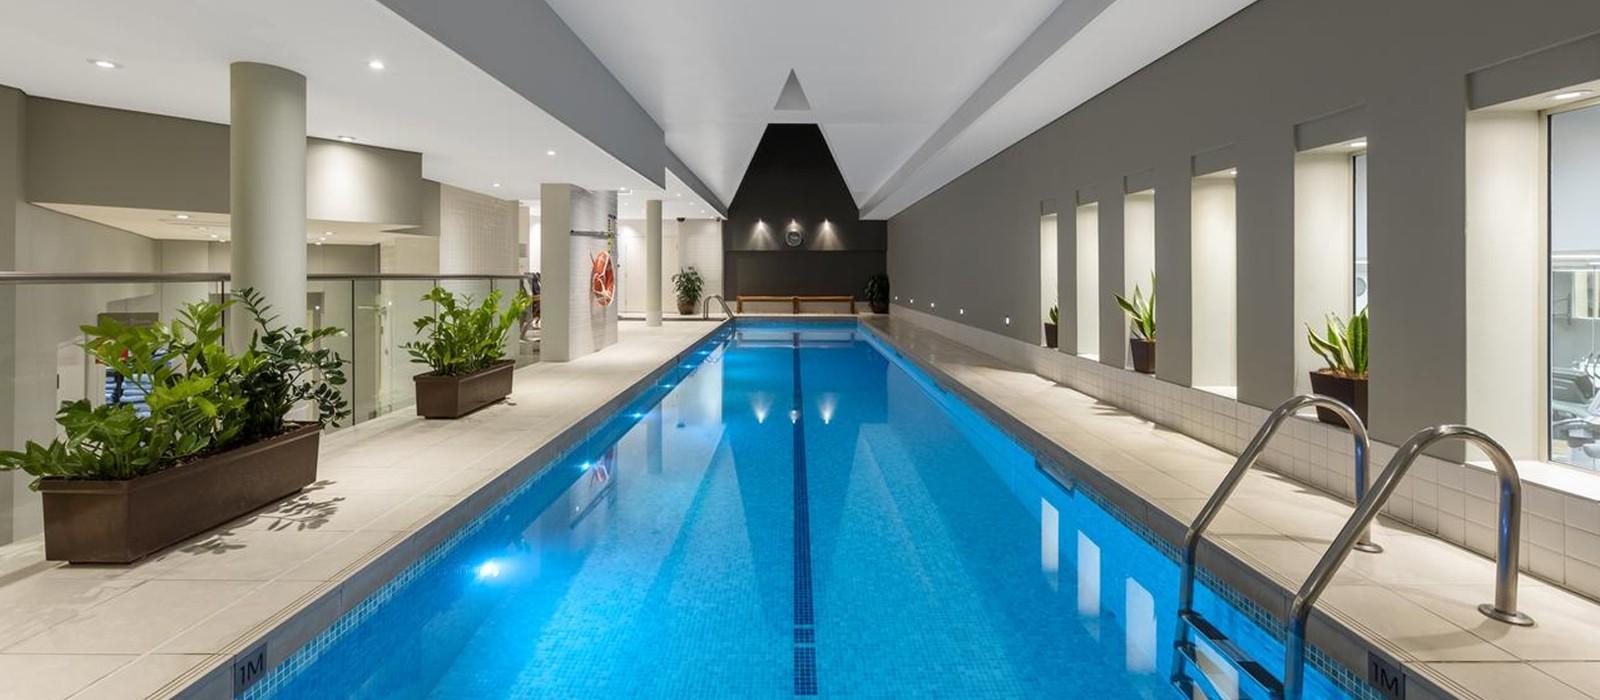 Luxury Sydney Holiday Packages Radisson Blu Plaza Hotel Sydney Header